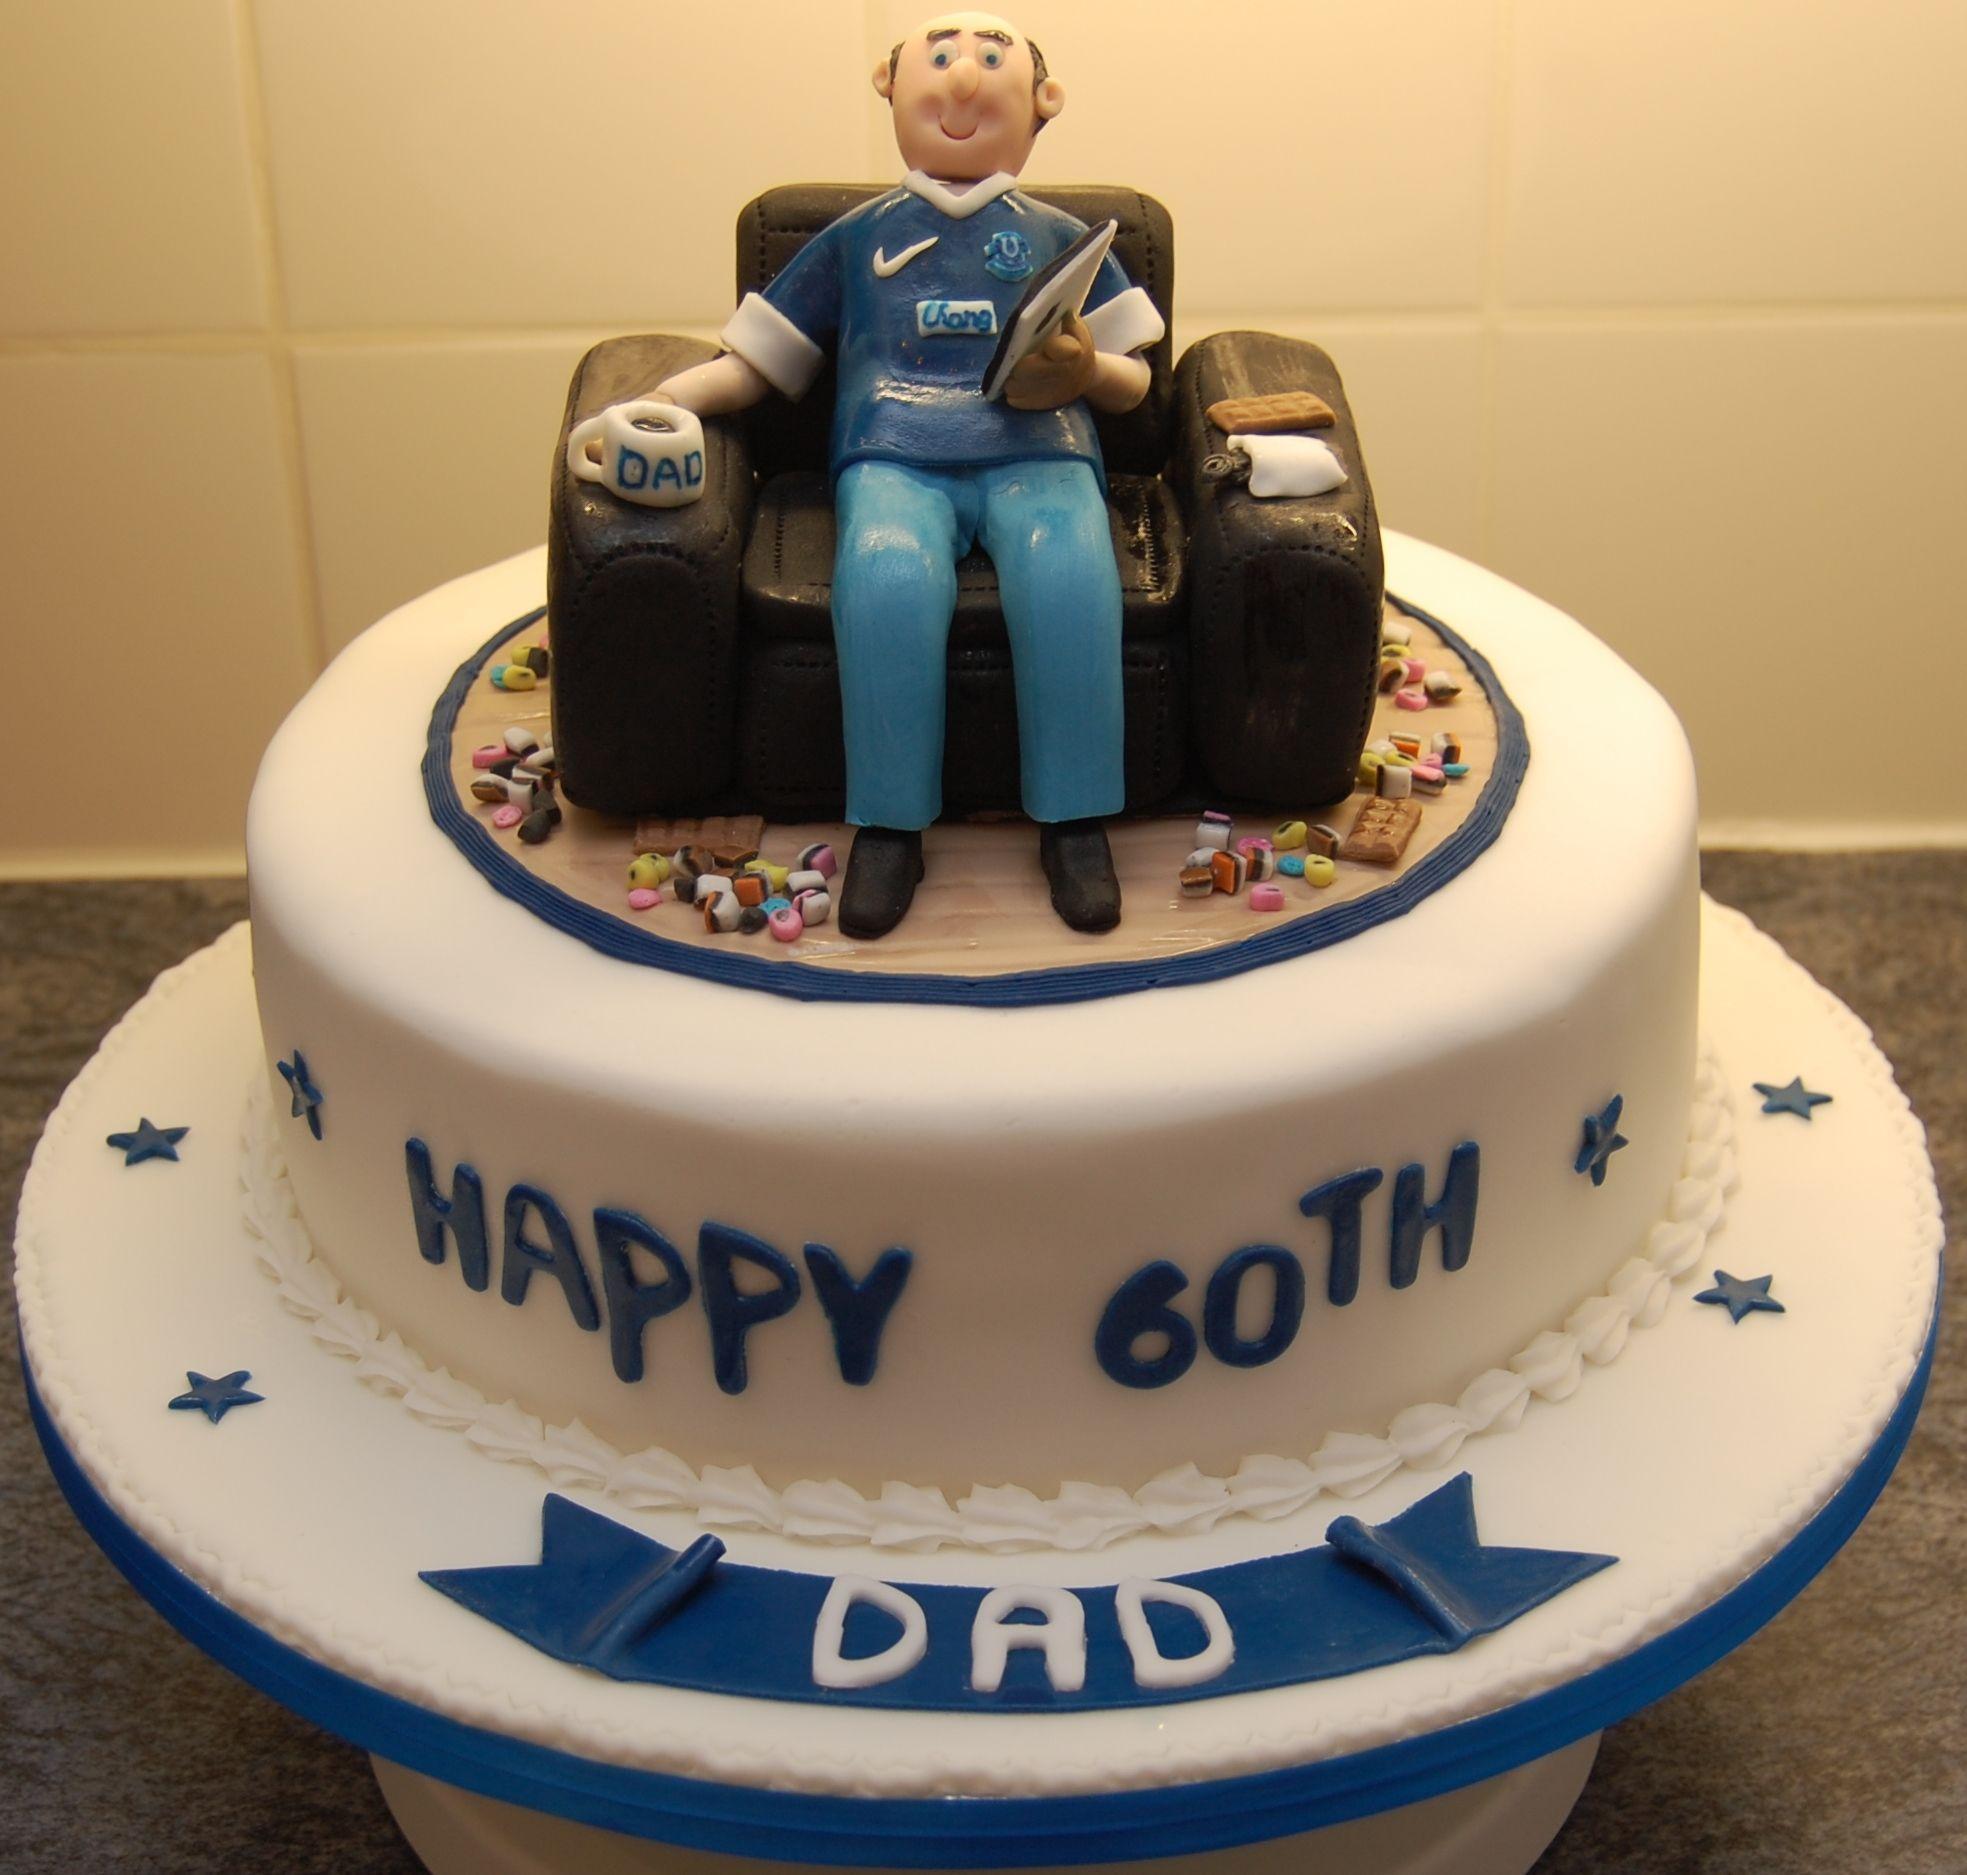 Terrific Everton Cake Google Search 60Th Birthday Cakes 60Th Birthday Funny Birthday Cards Online Kookostrdamsfinfo